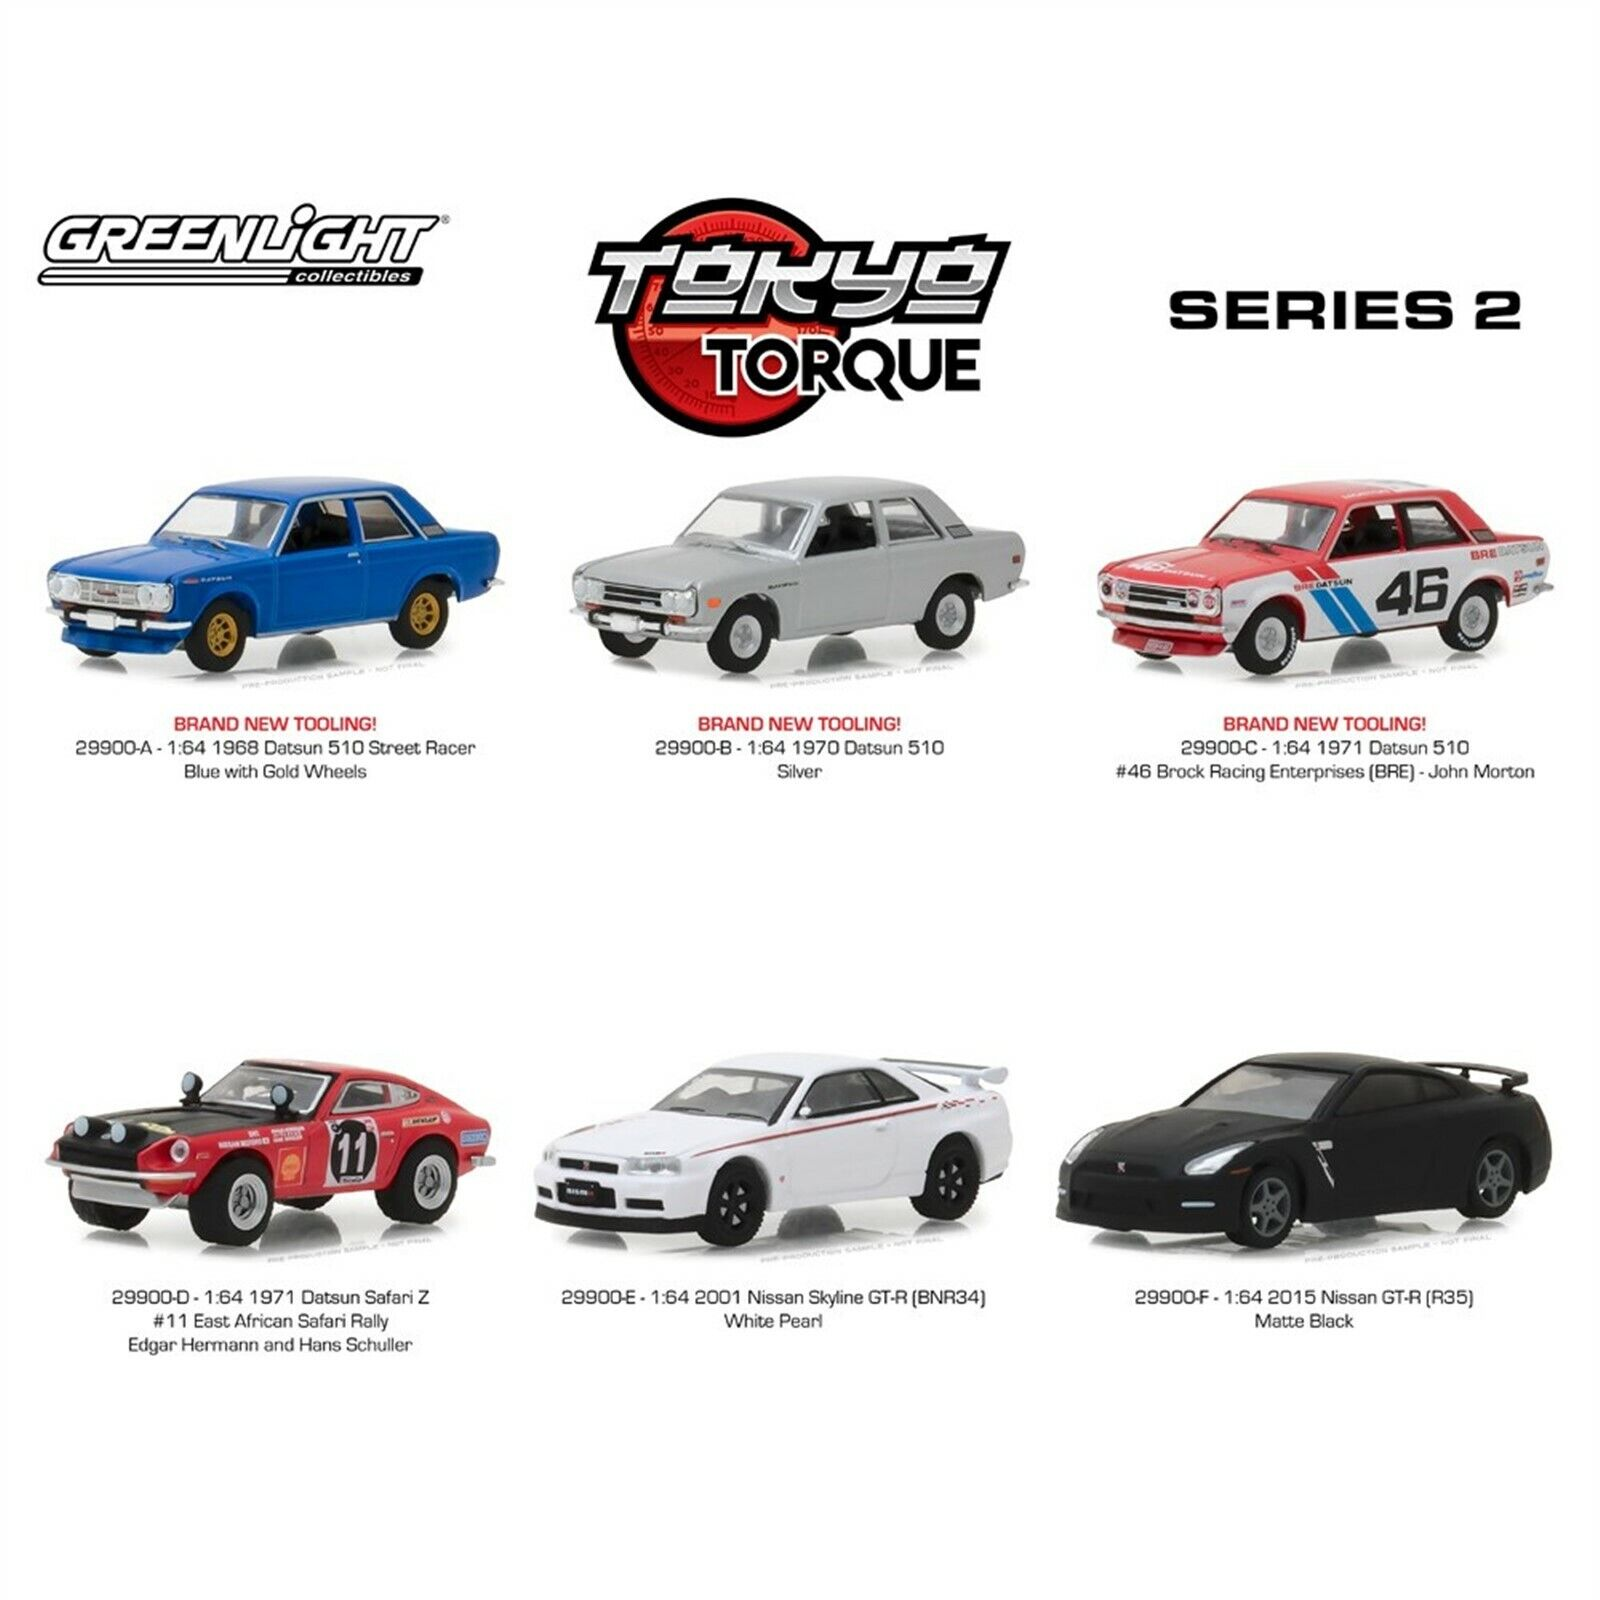 Greenlight 1//64 Tokyo Torque Series 2 2015 Nissan Skyline GT-R R35 BLACK 29900-F